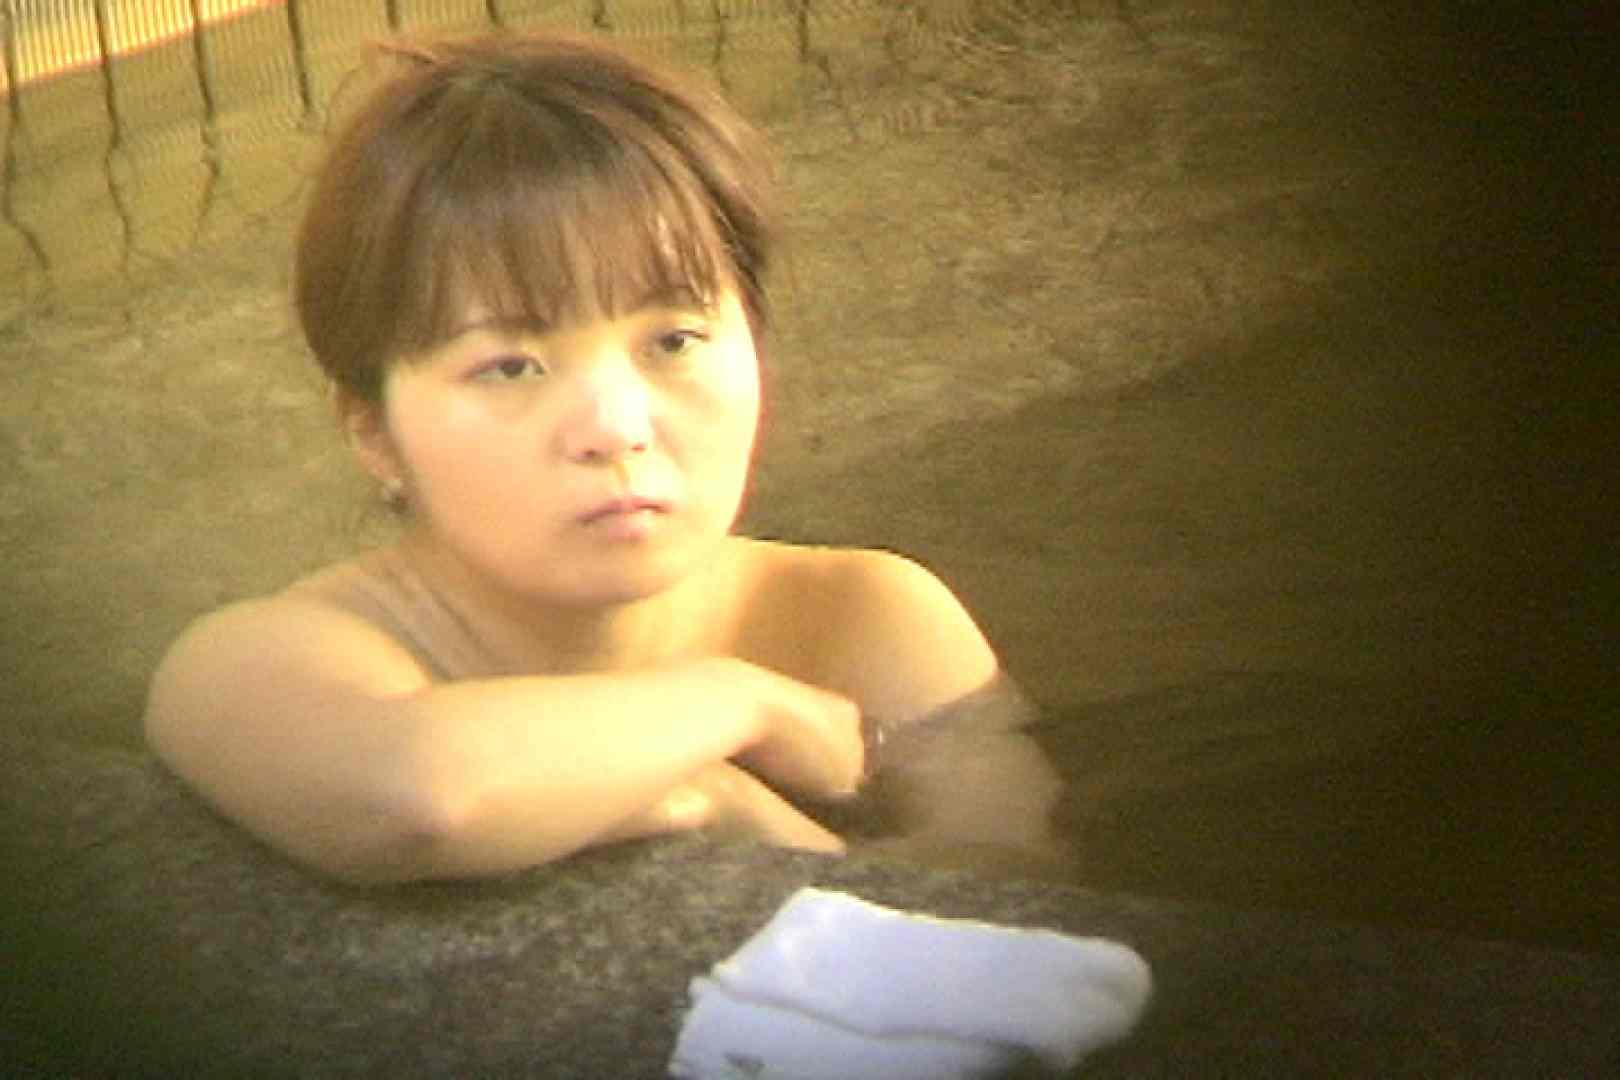 Aquaな露天風呂Vol.453 0 | 0  66連発 53